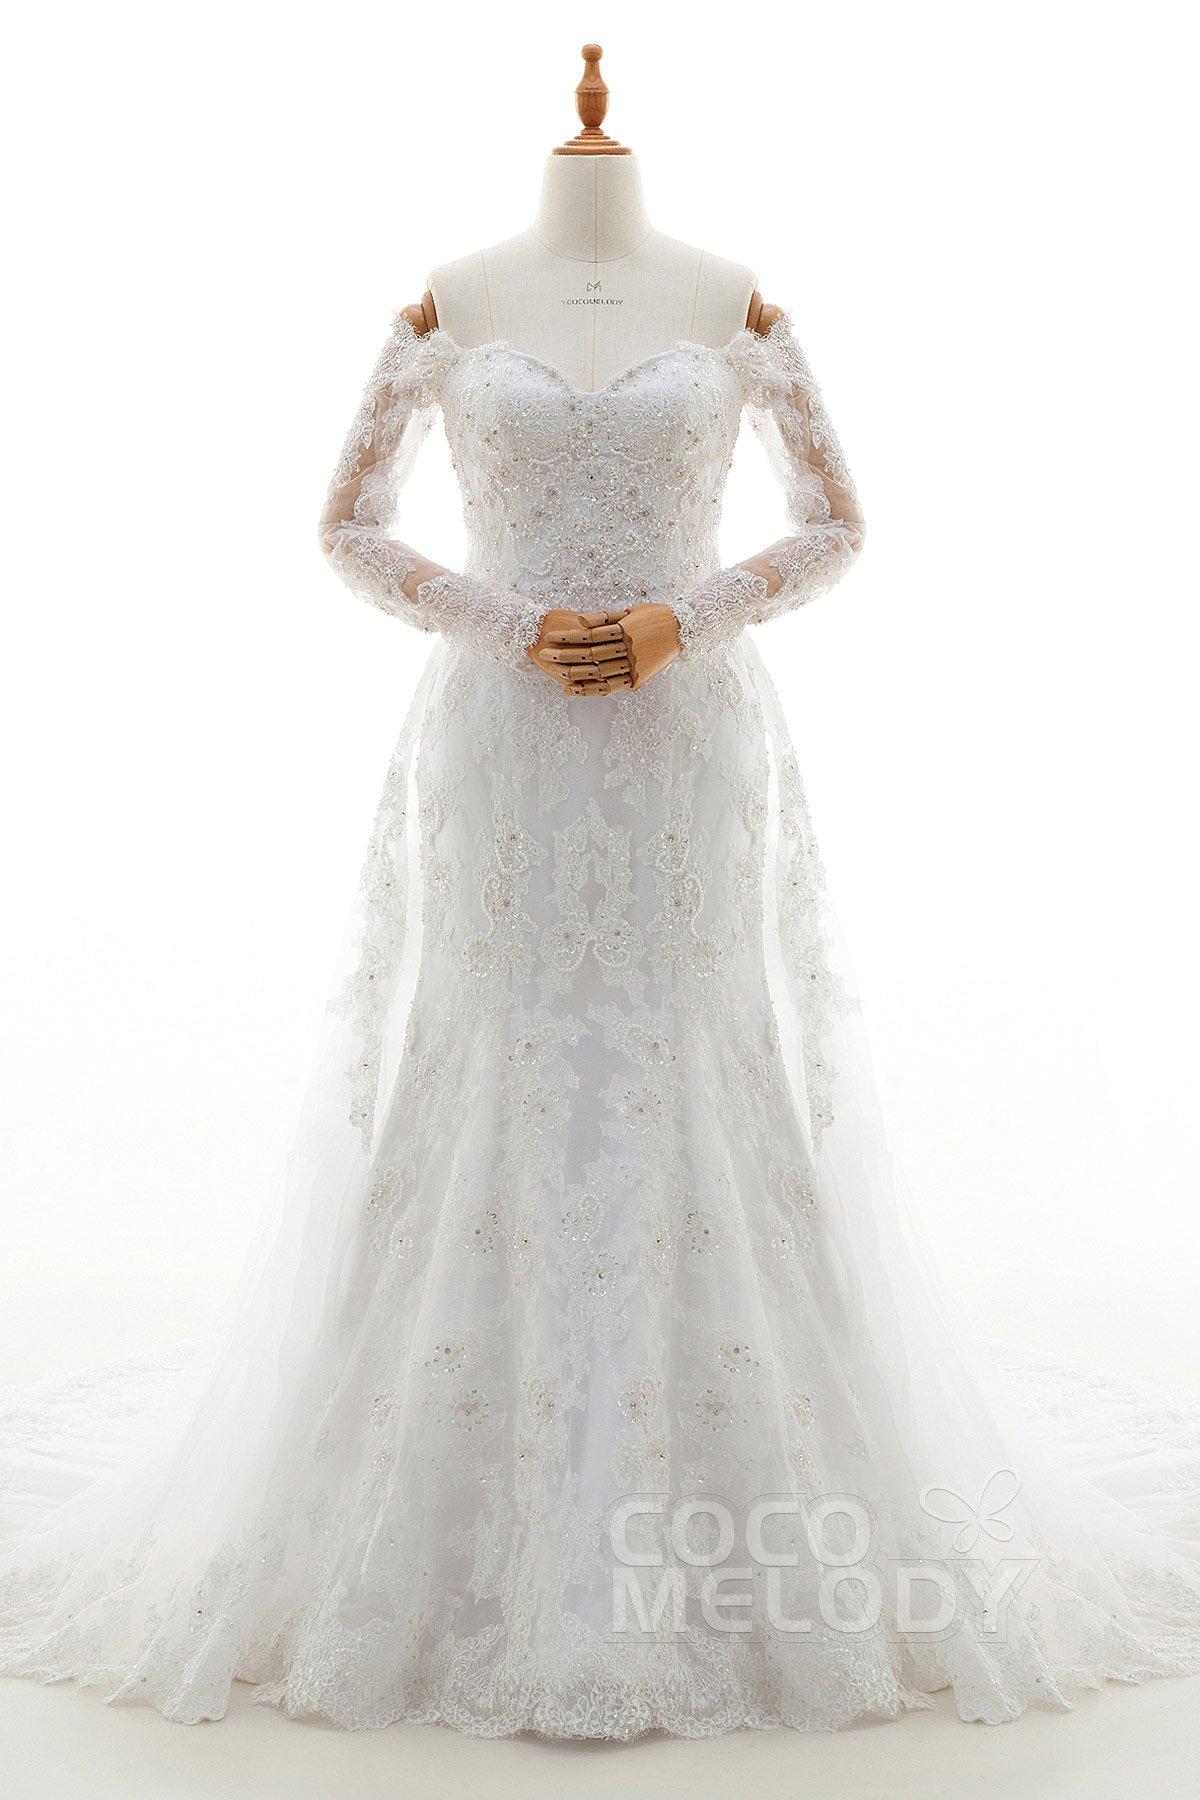 Plus Size Wedding Dresses, Custom Size Bridal Dresses ...